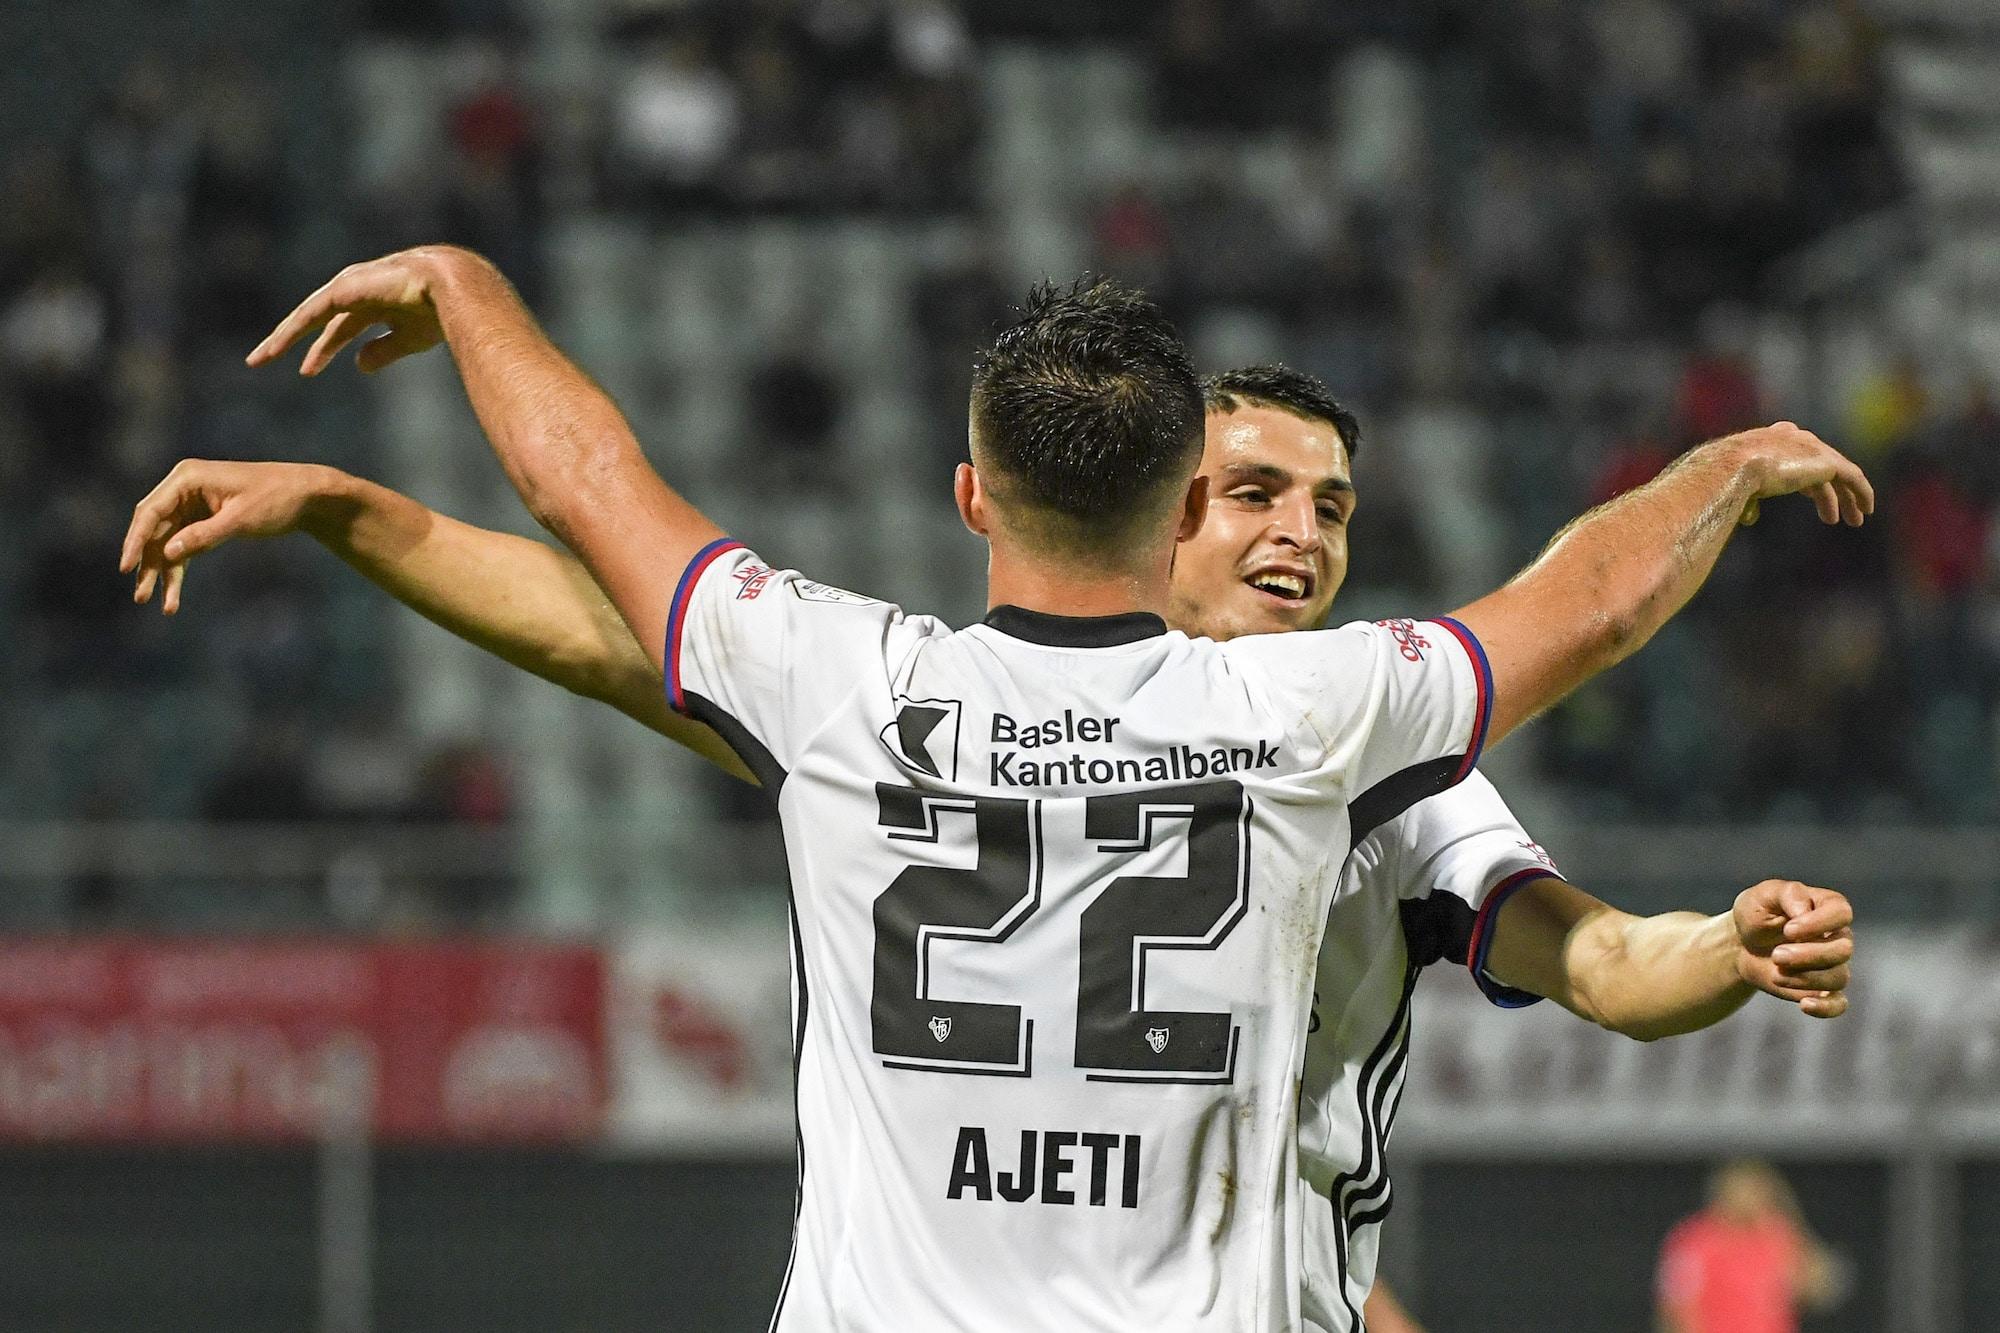 14.10.2017; Lugano; Fussball Super League -  FC Lugano - FC Basel; Albian Ajeti (Basel)  und Mohamed Elyounoussi (Basel) jube